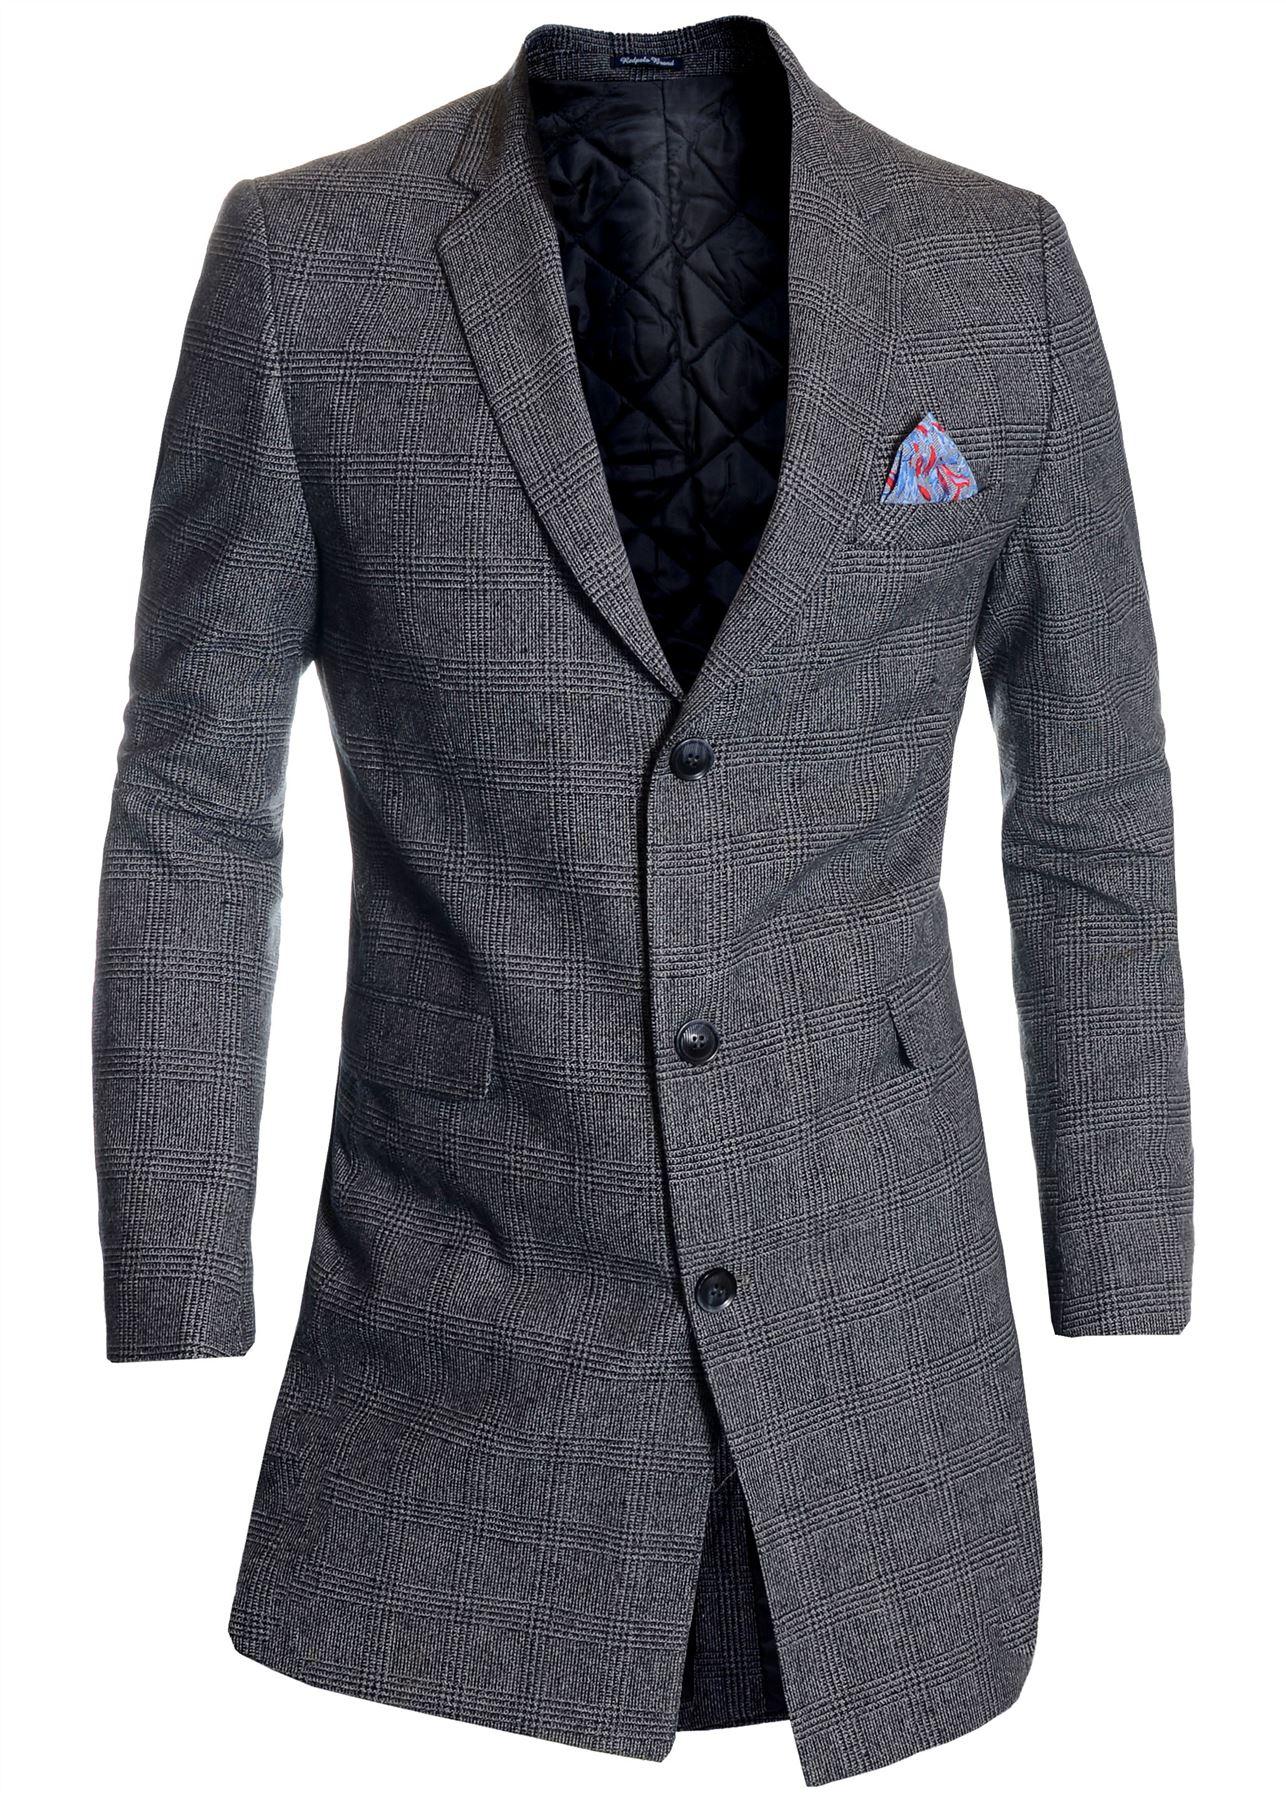 Men-039-s-Checkered-Coat-3-4-Long-Tweed-Cashmere-Wool-Trendy-Formal-Winter-Overcoat thumbnail 13